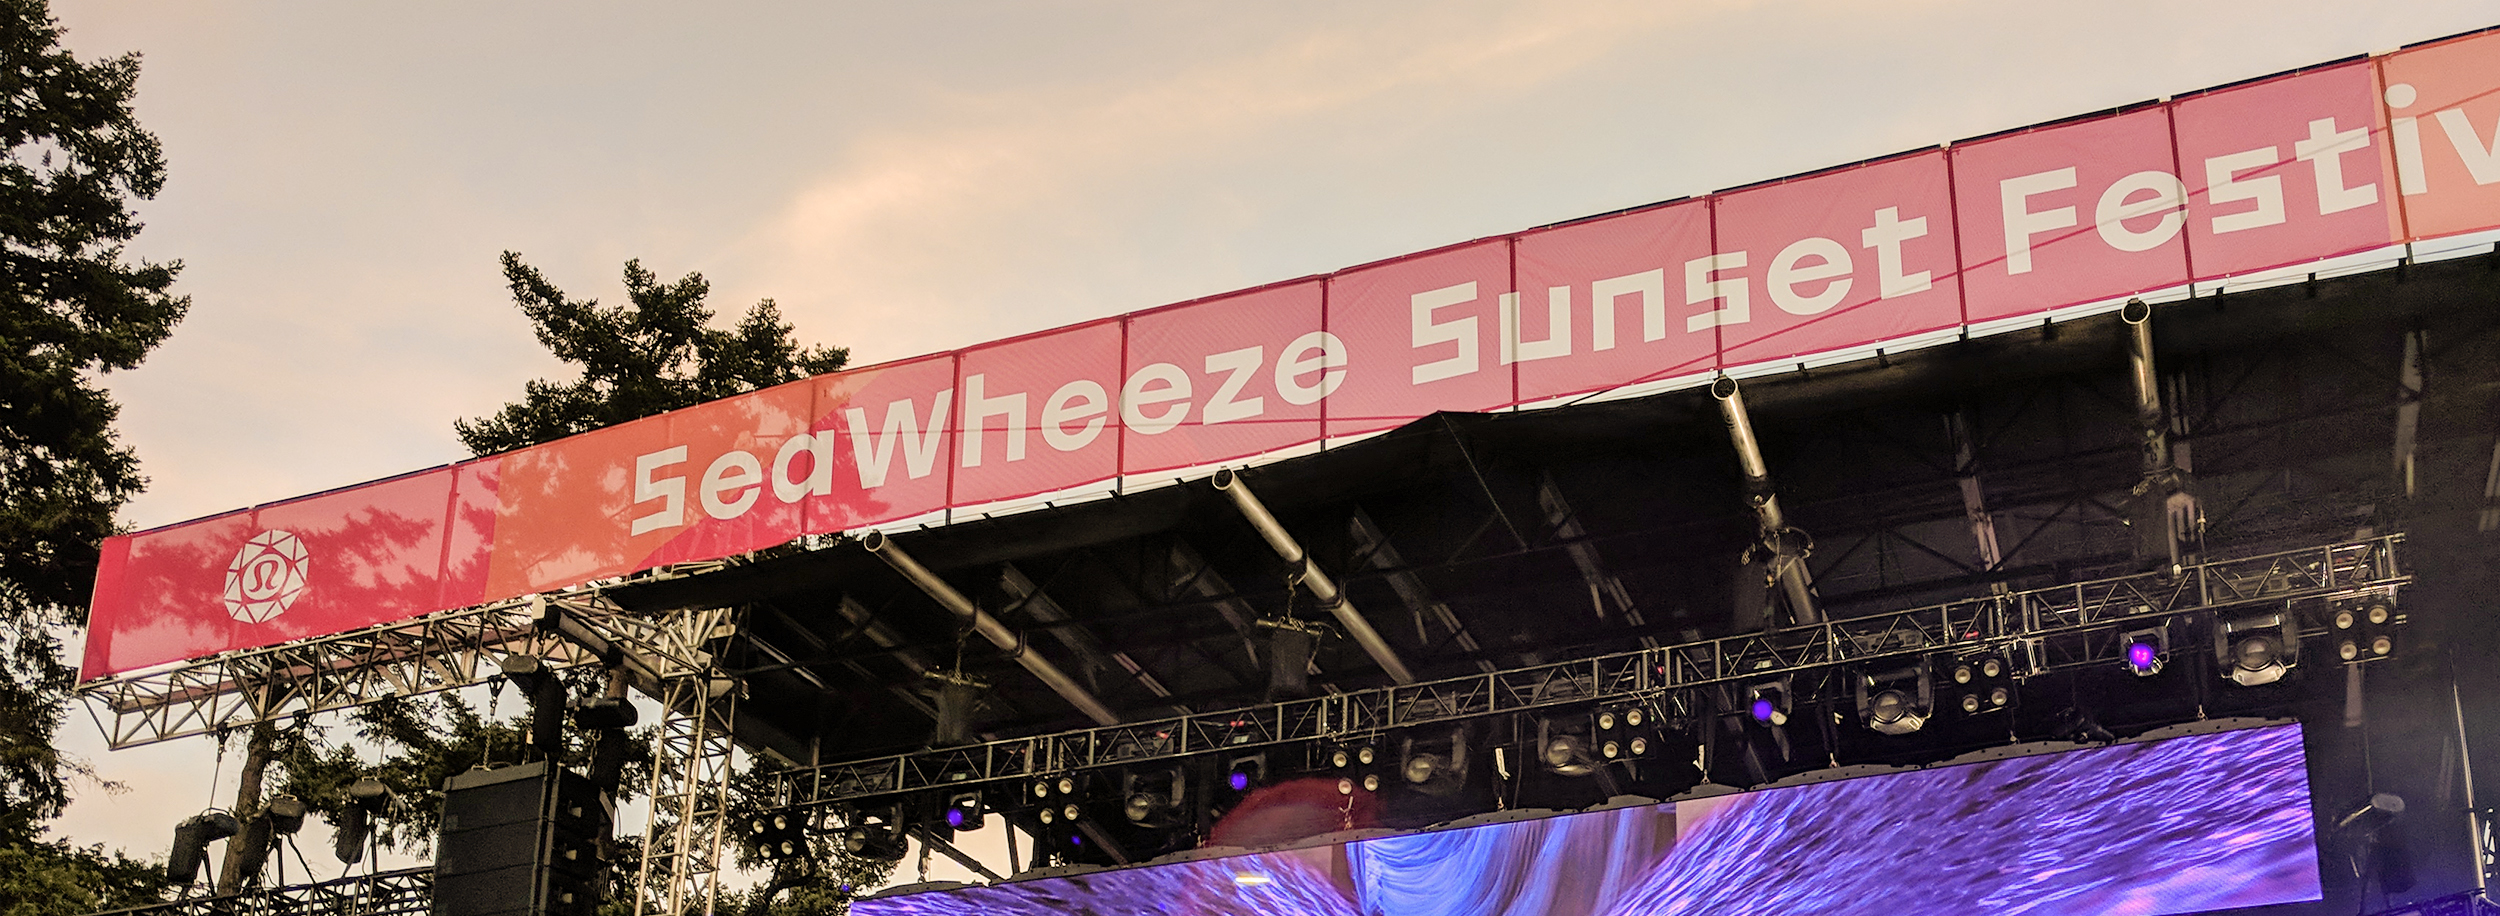 SeaWheeze Banner 2019.jpg